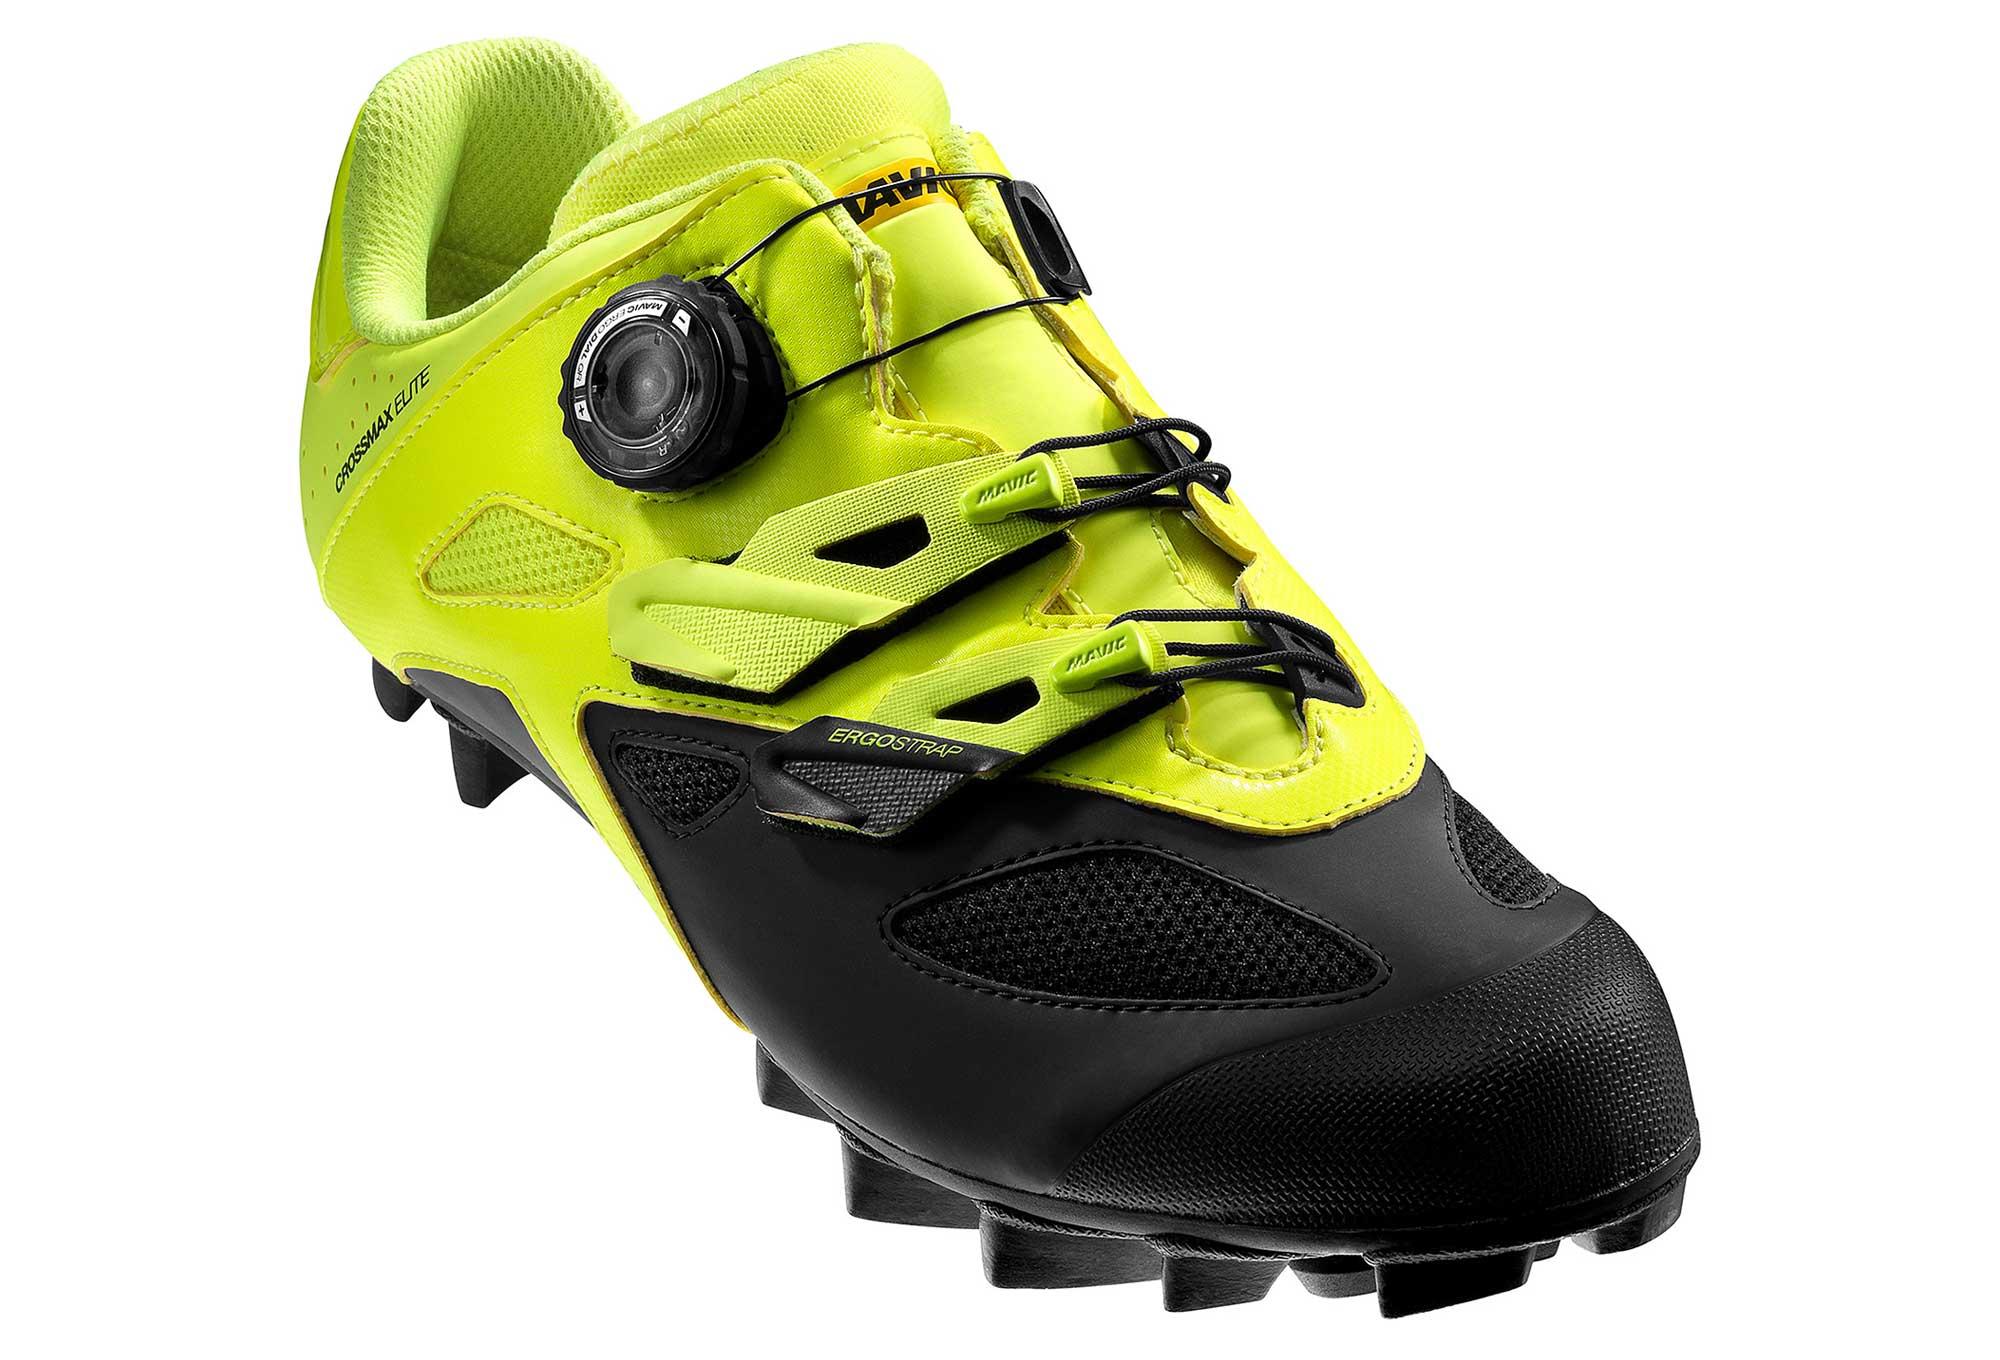 Chaussures VTT Mavic Crossmax Elite Jaune Fluo Noir